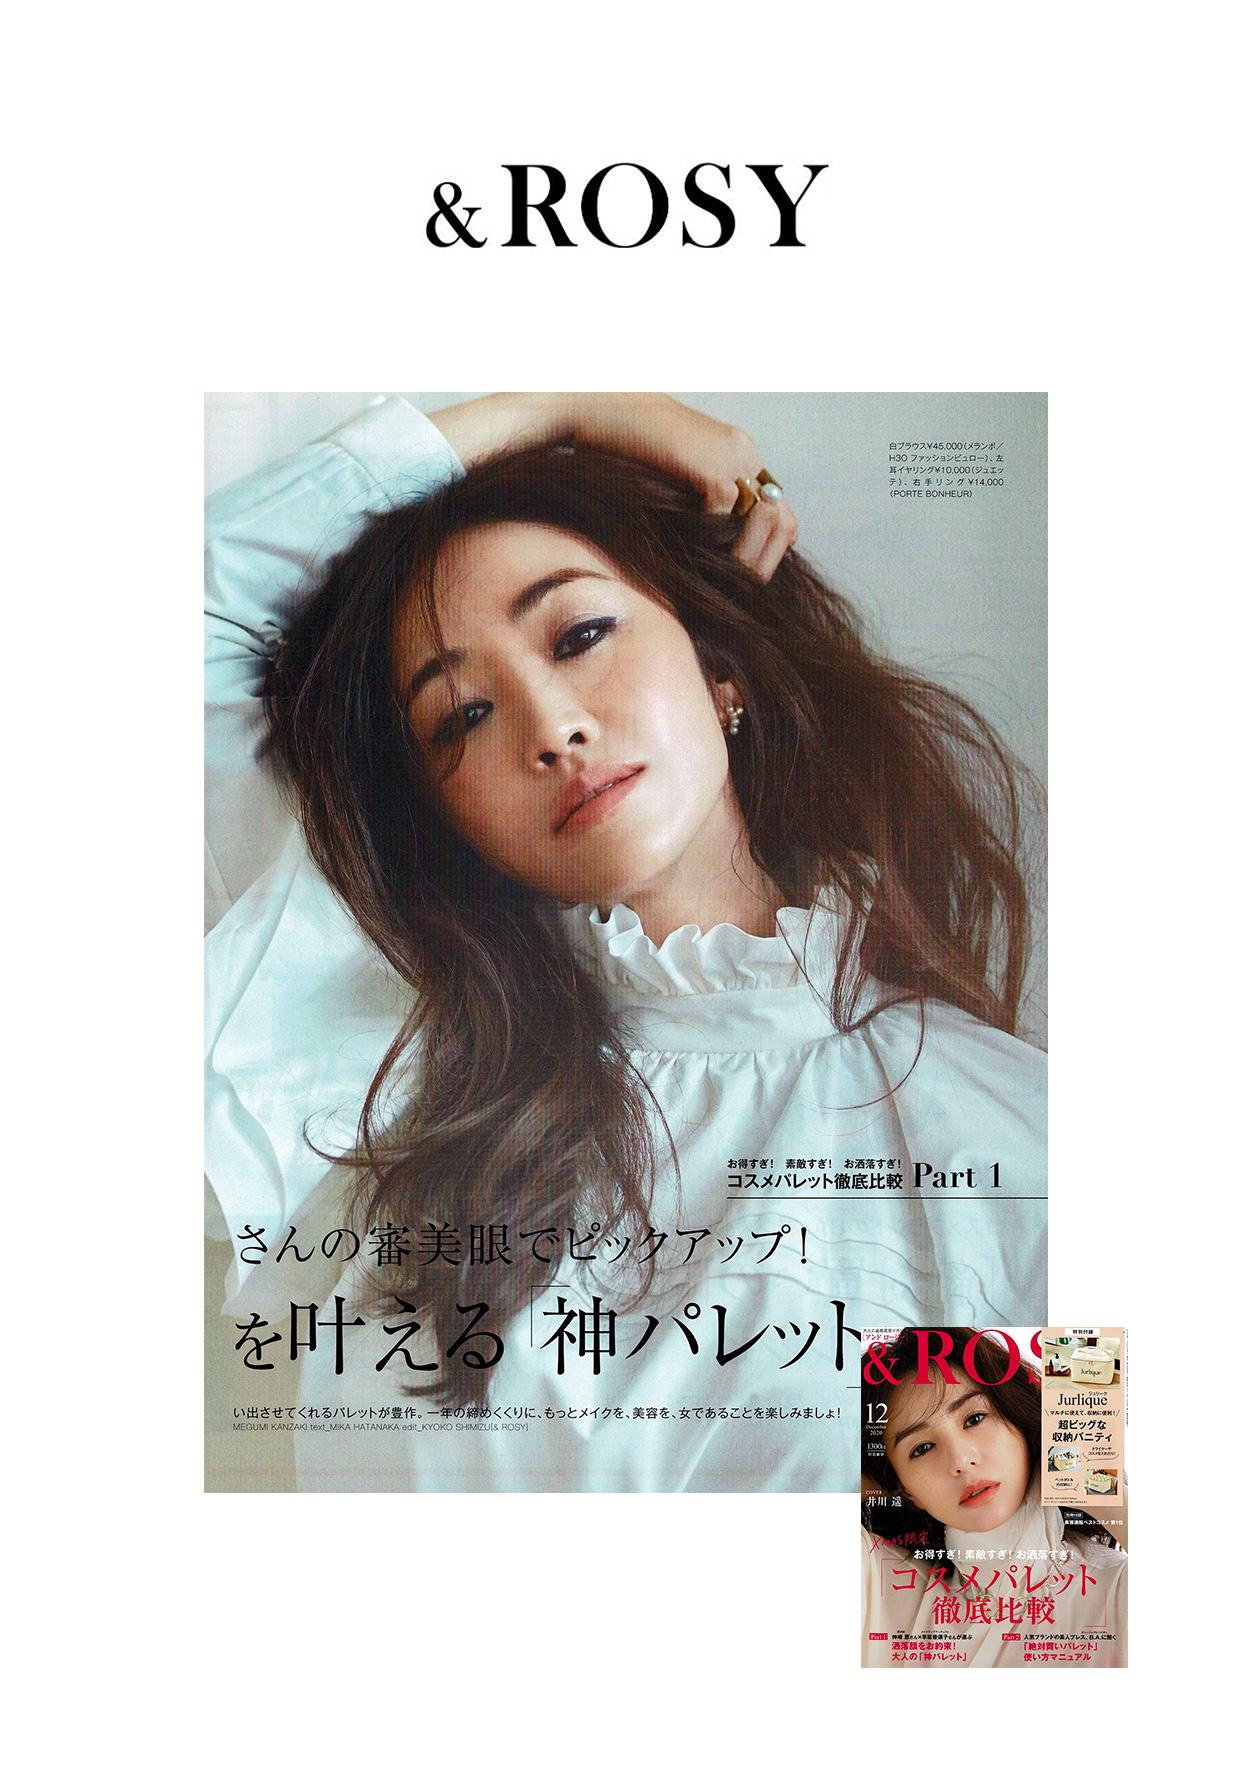 melampo press on rosy magazine